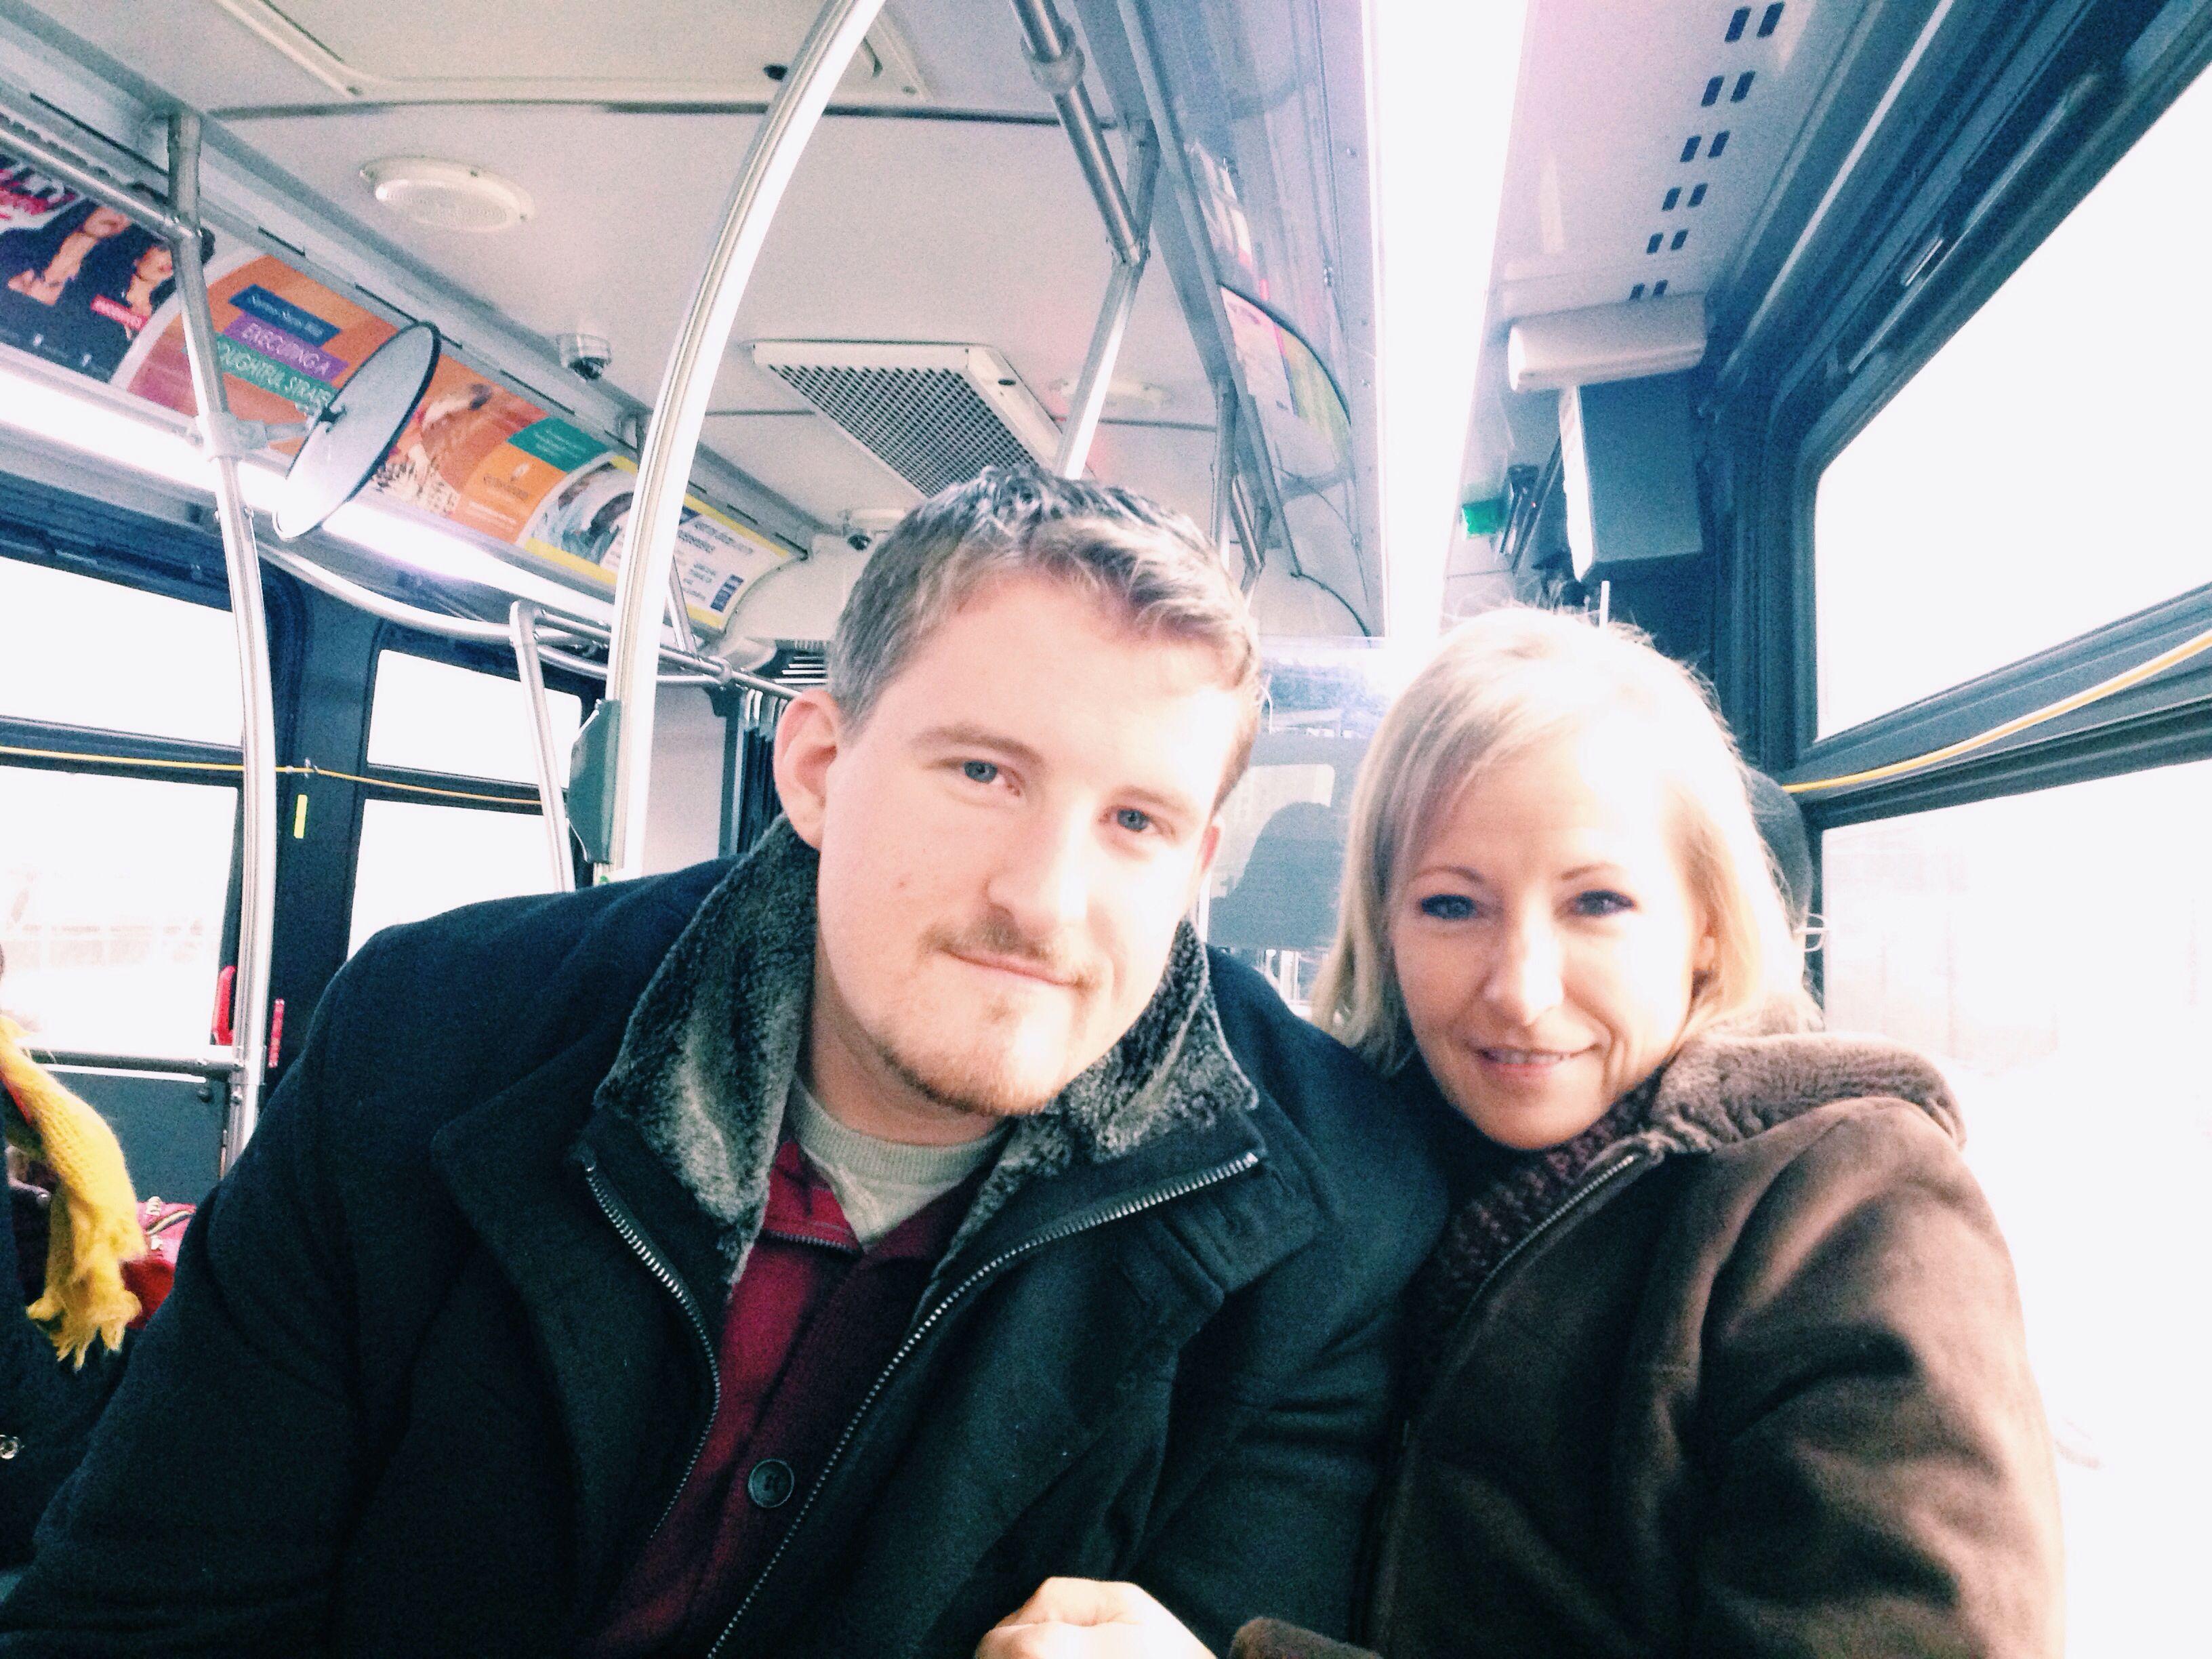 momma & brother // New York City // December 9, 2013